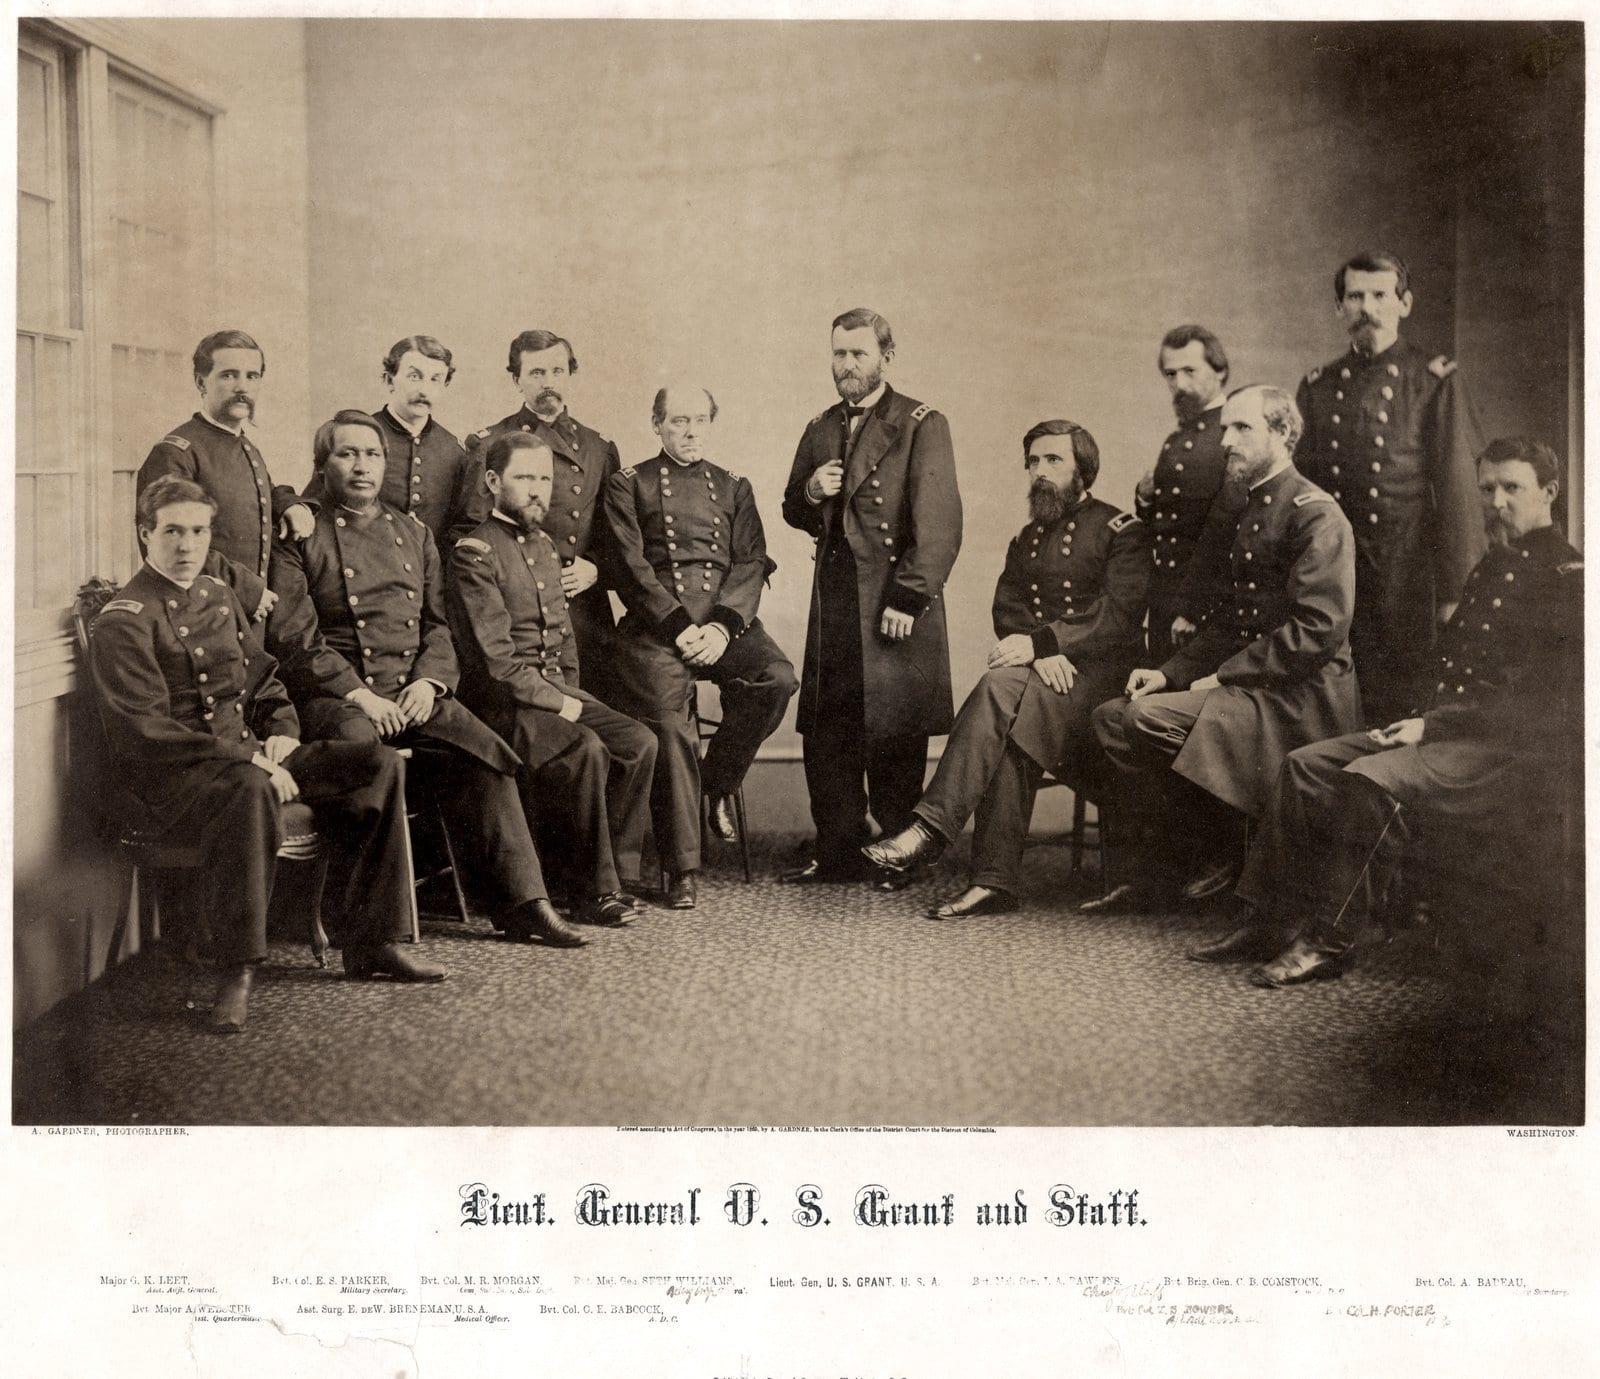 Lieut General U S Grant and staff - Civil War photograph